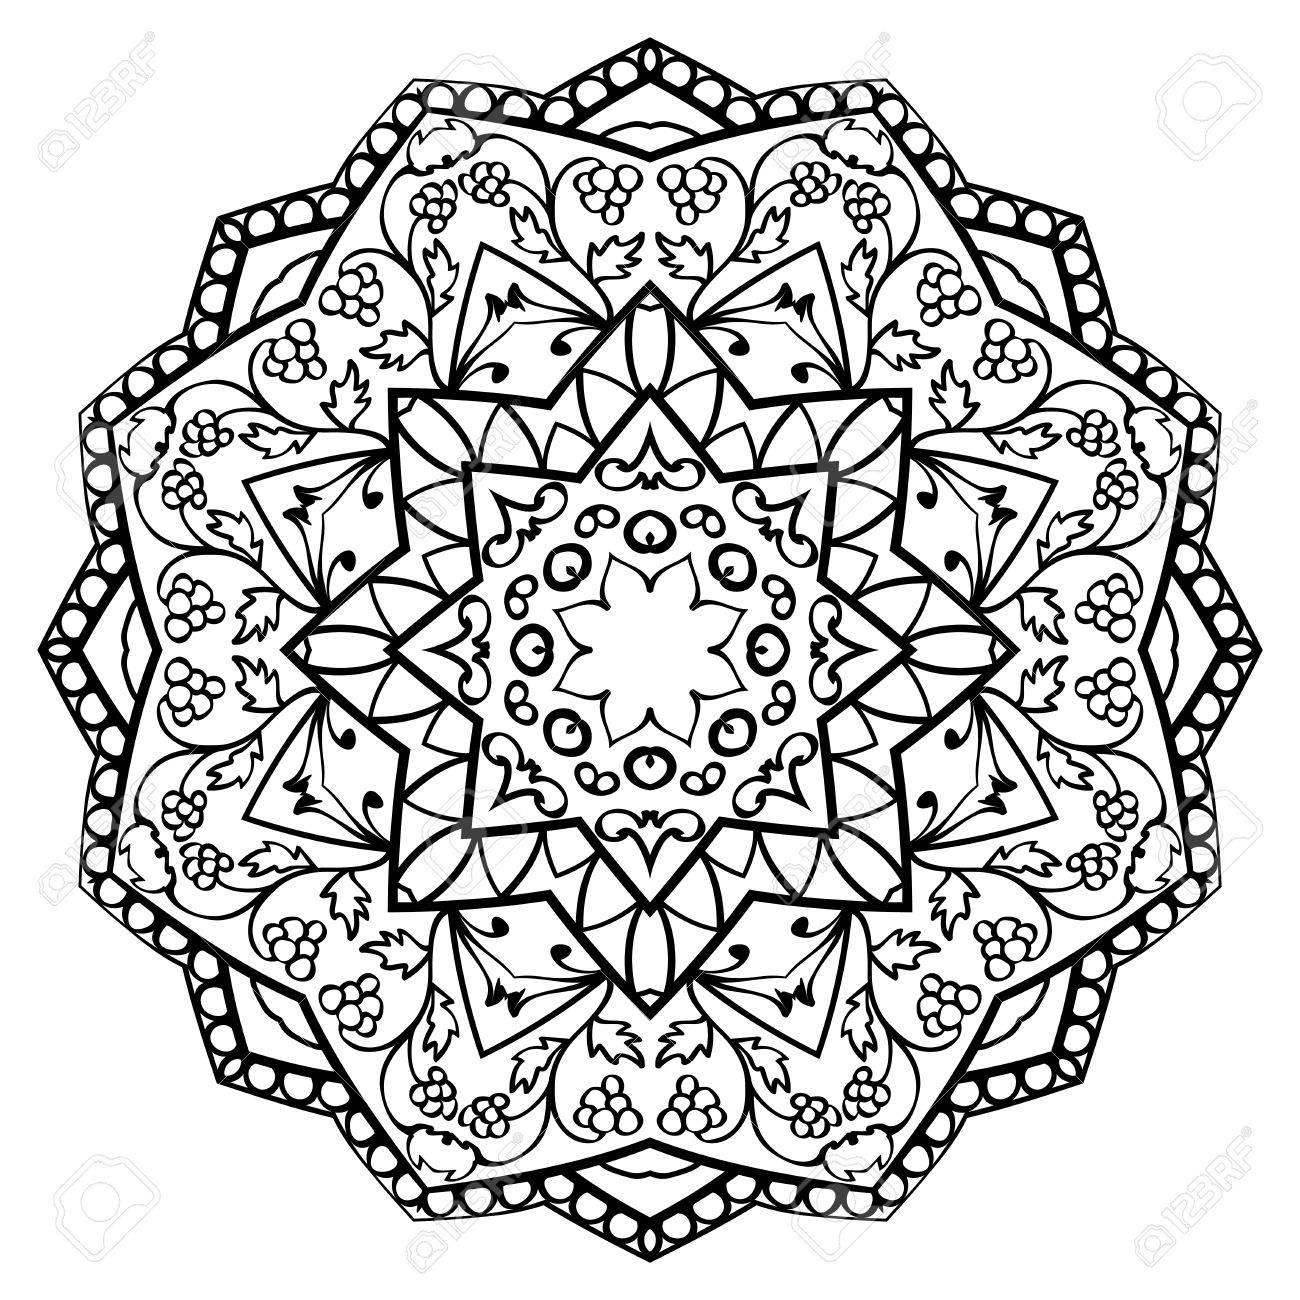 ornate mandala with floral elements isolated on white background